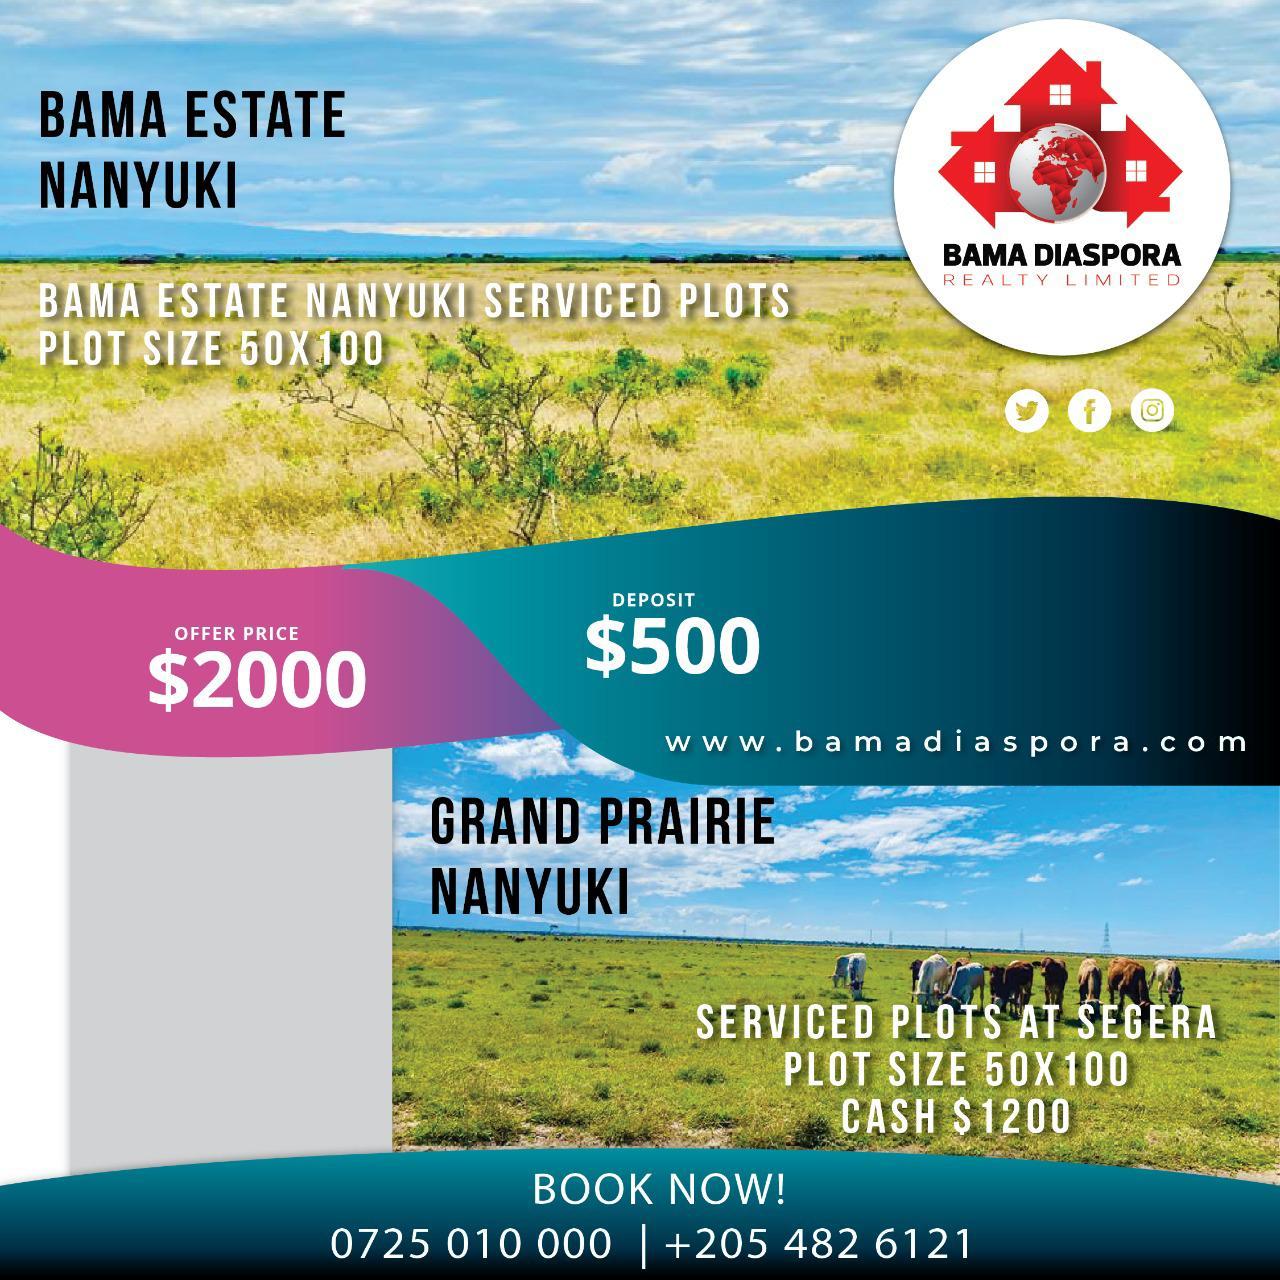 Bama Estate Nanyuki